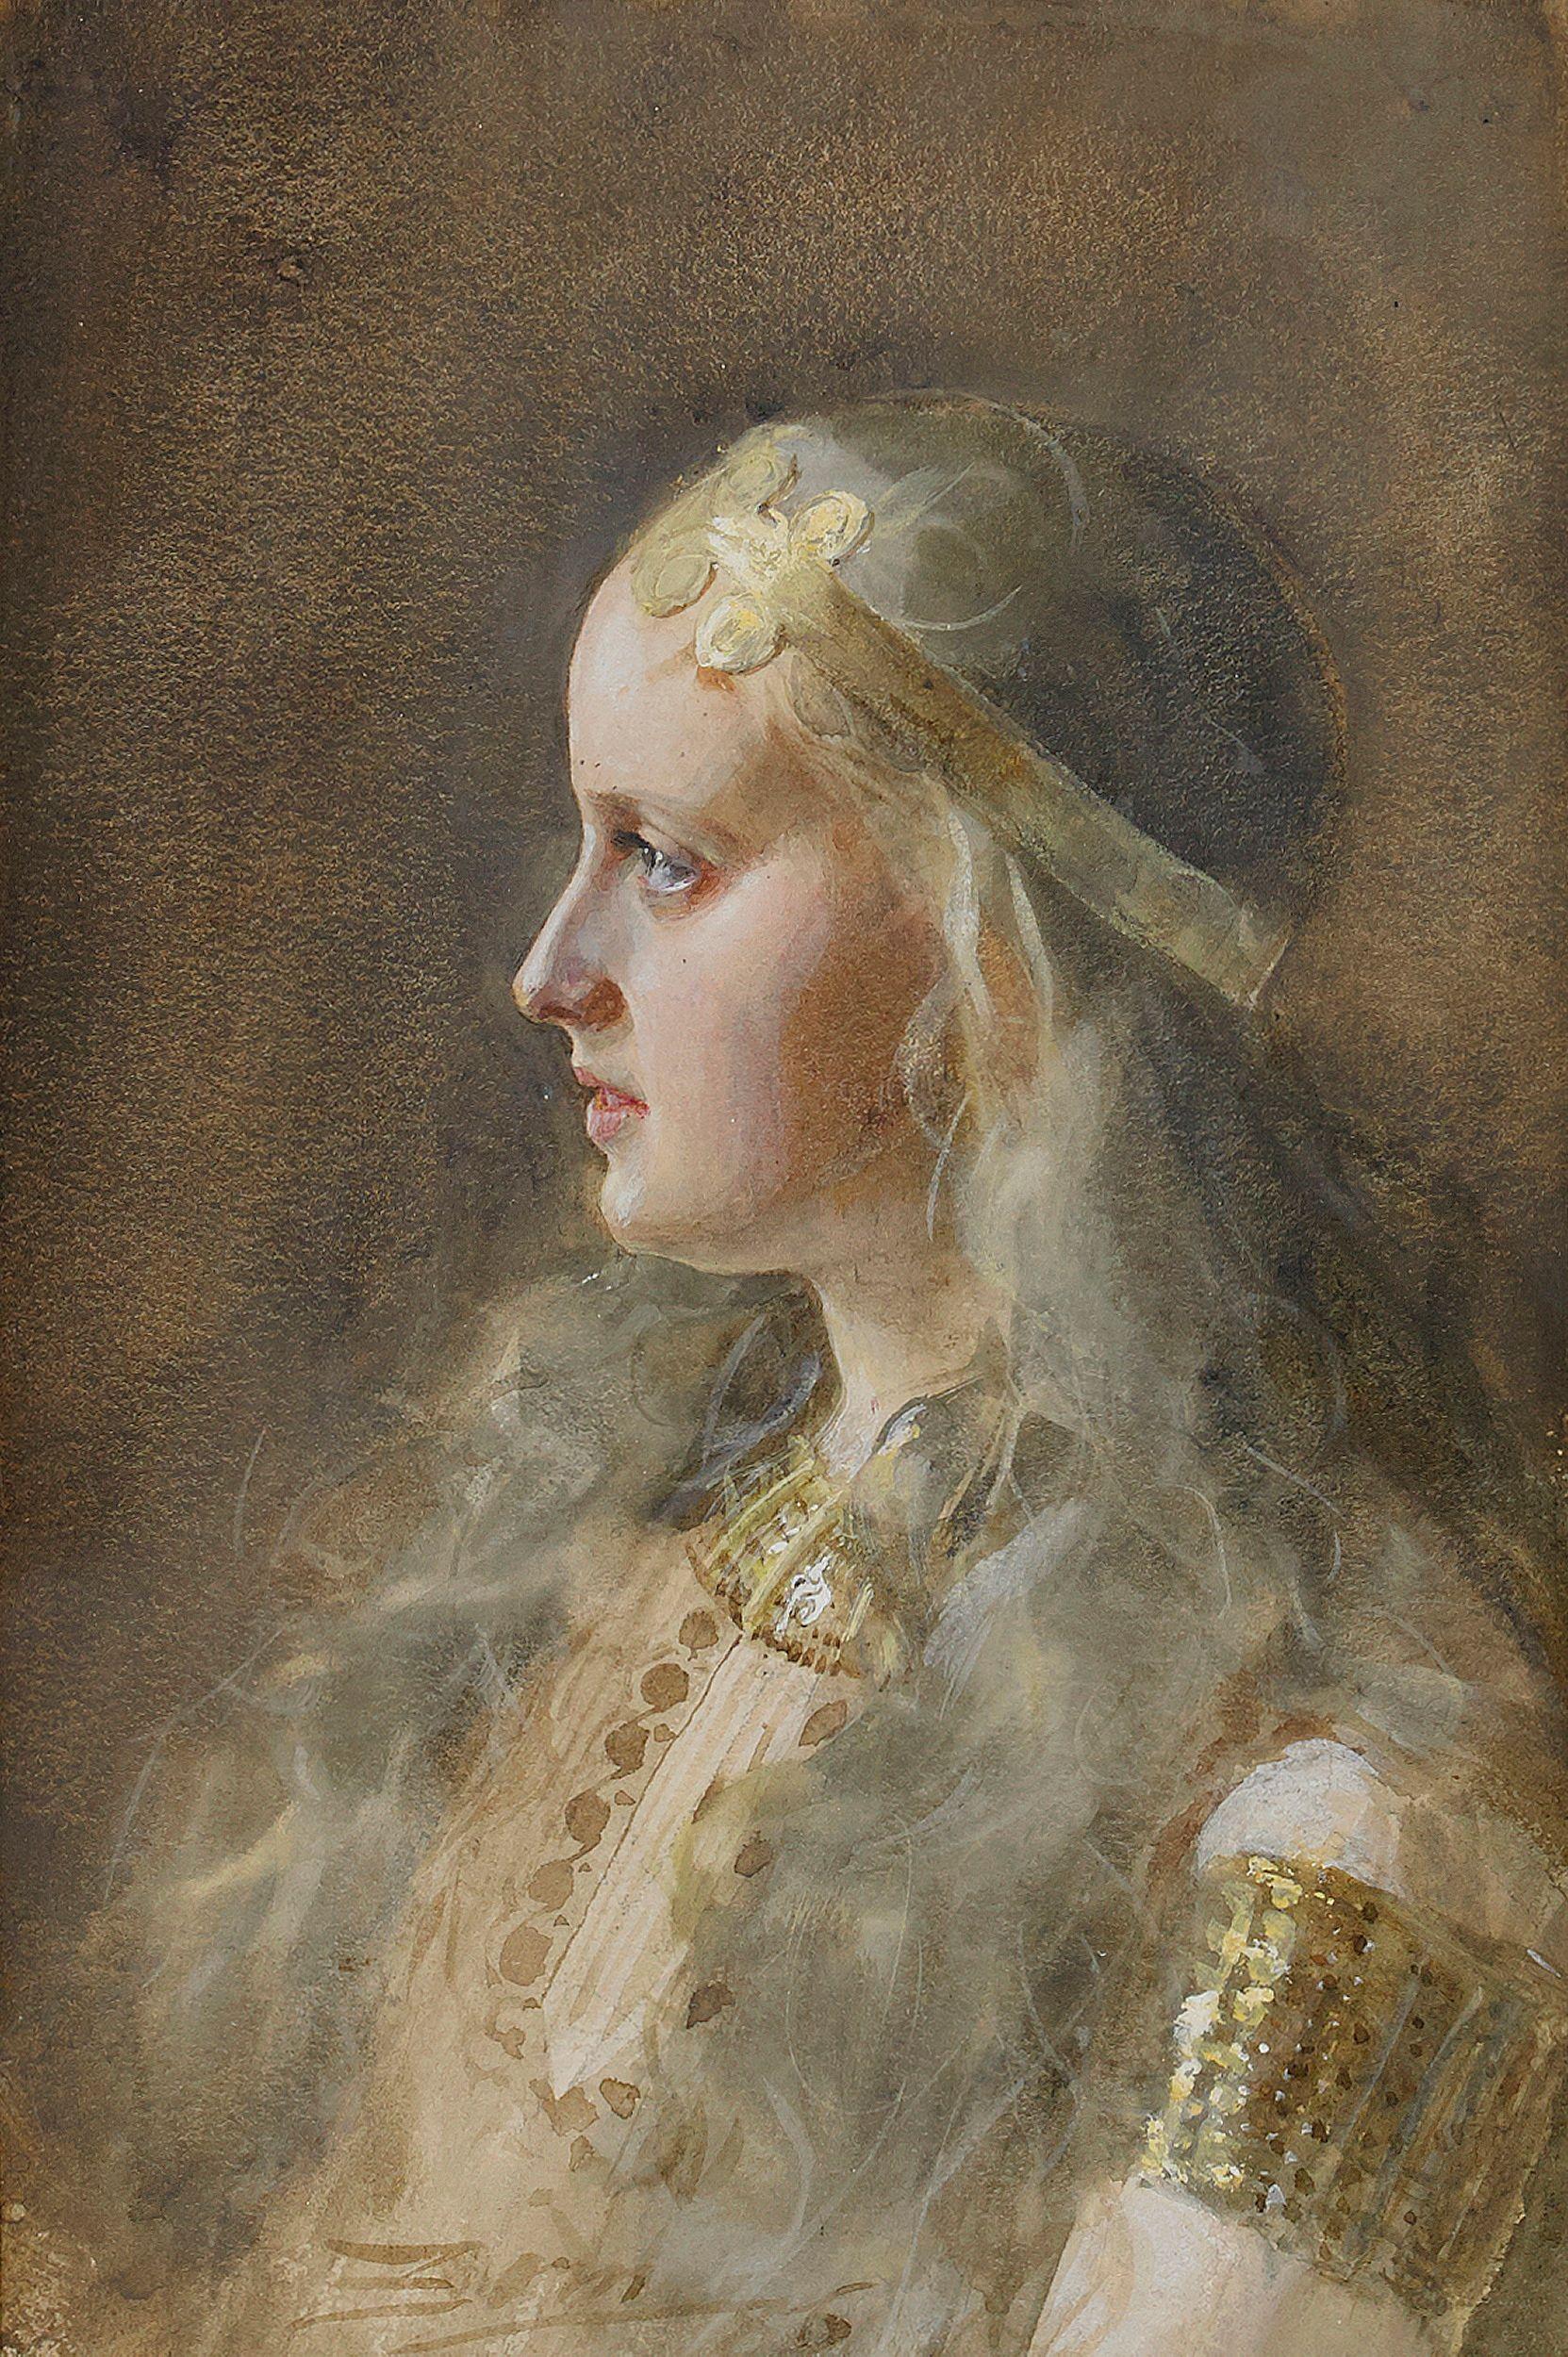 Gunnlod la hija de Suttung en una pintura de Andres Zonn de 1886